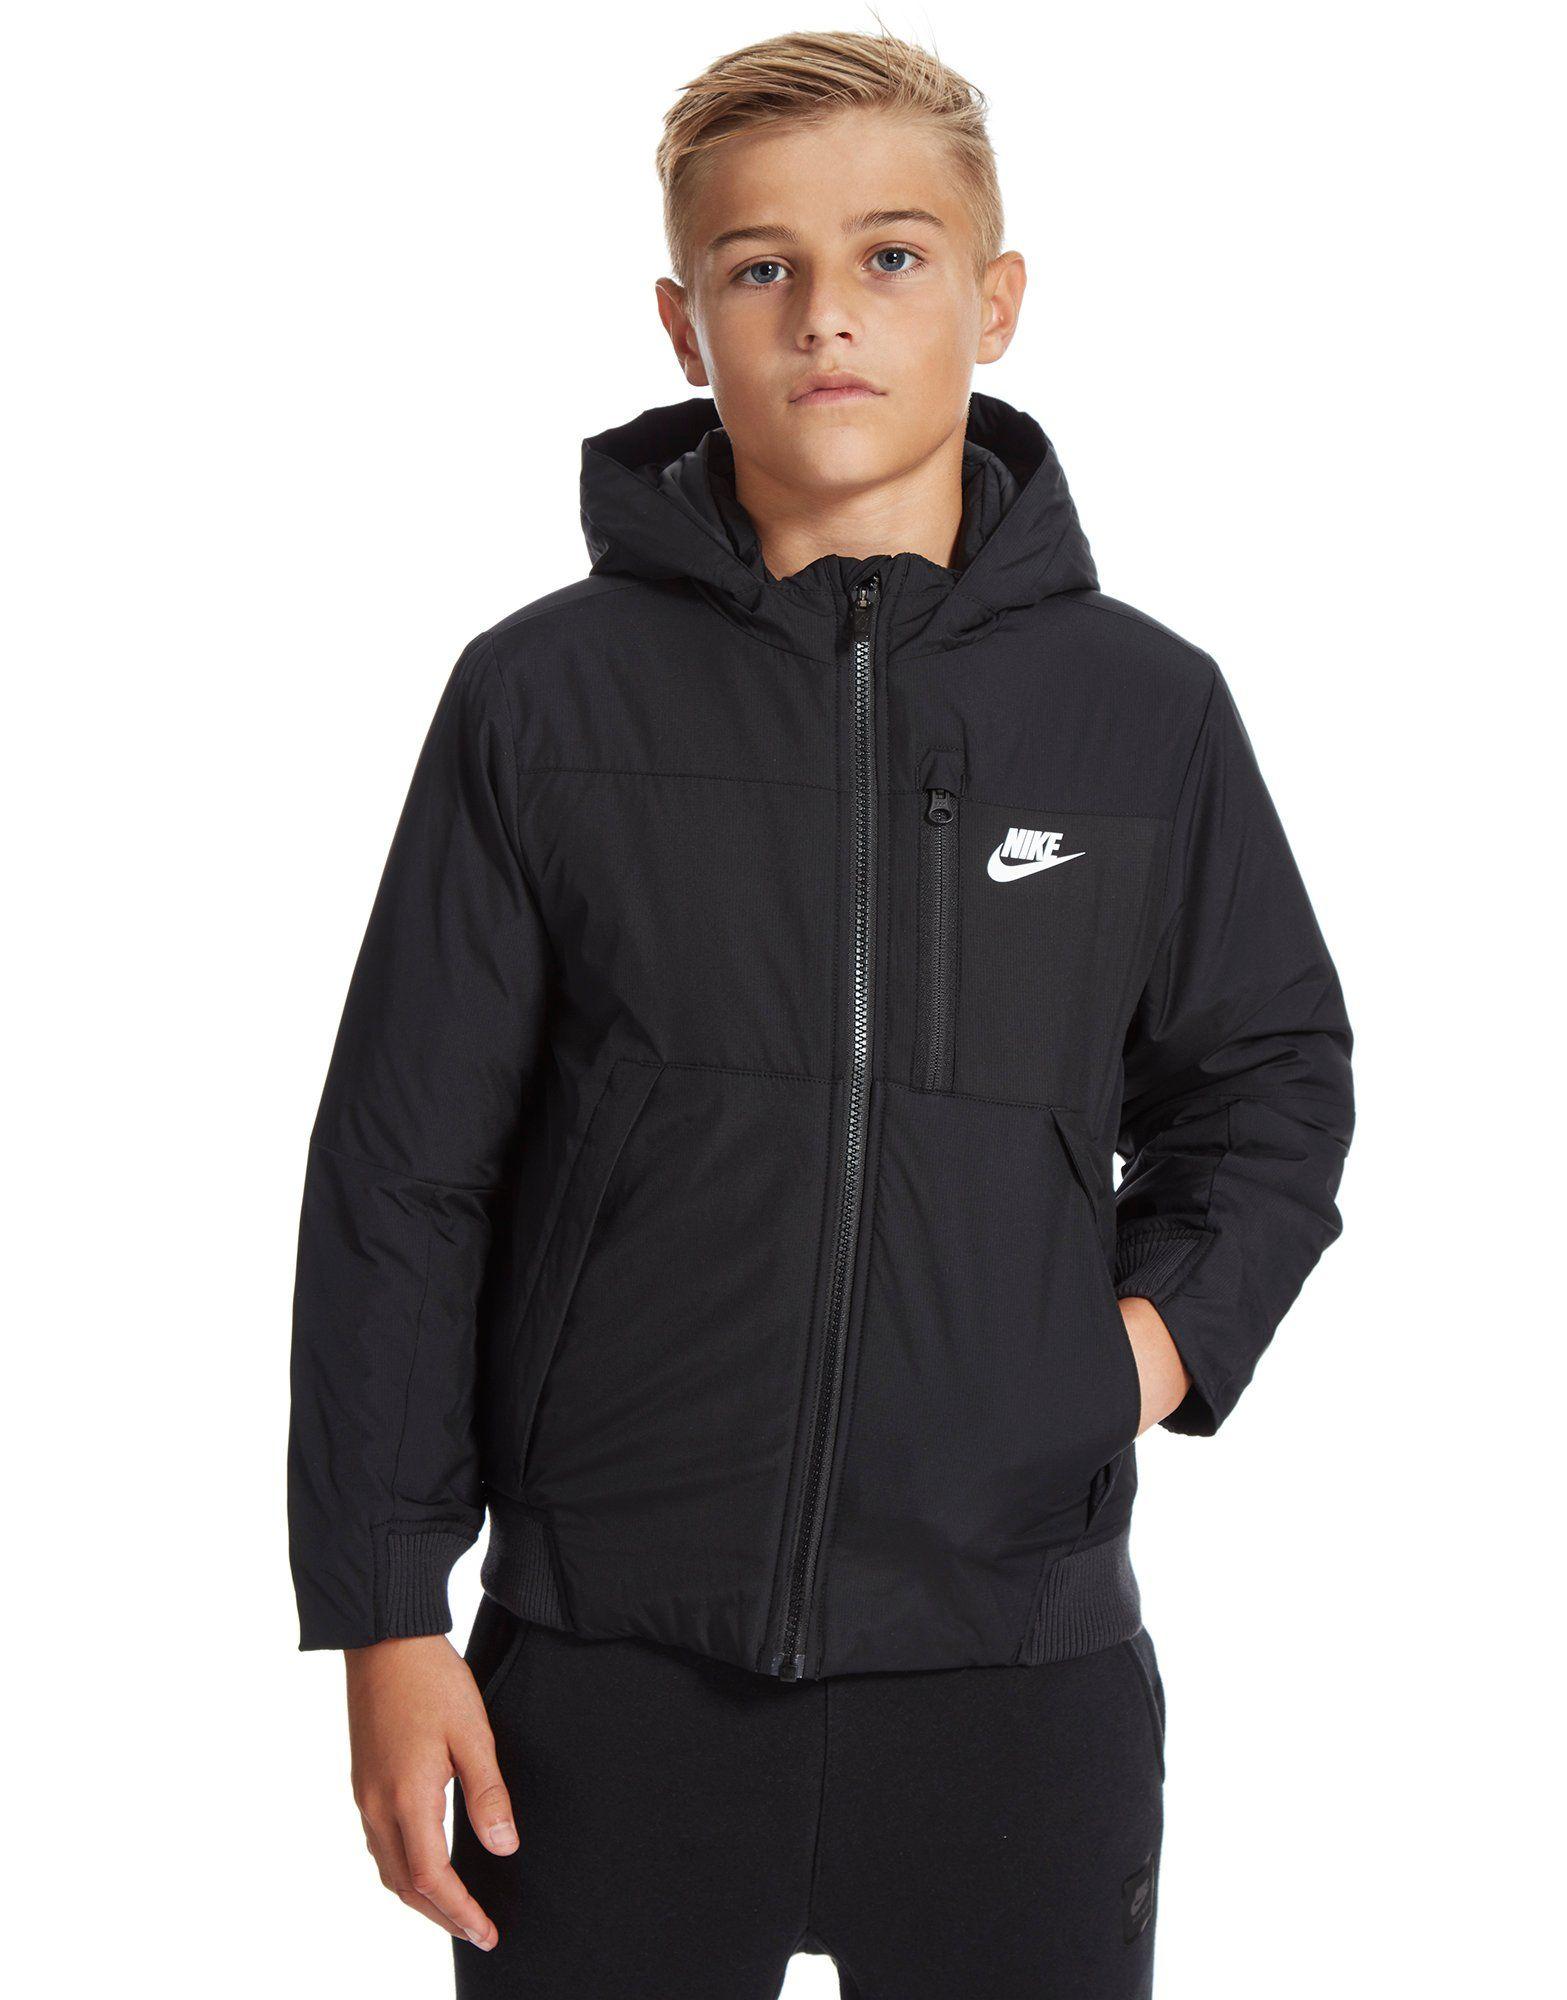 Nike jacket army - 1 Review Nike Core Padded Jacket Junior